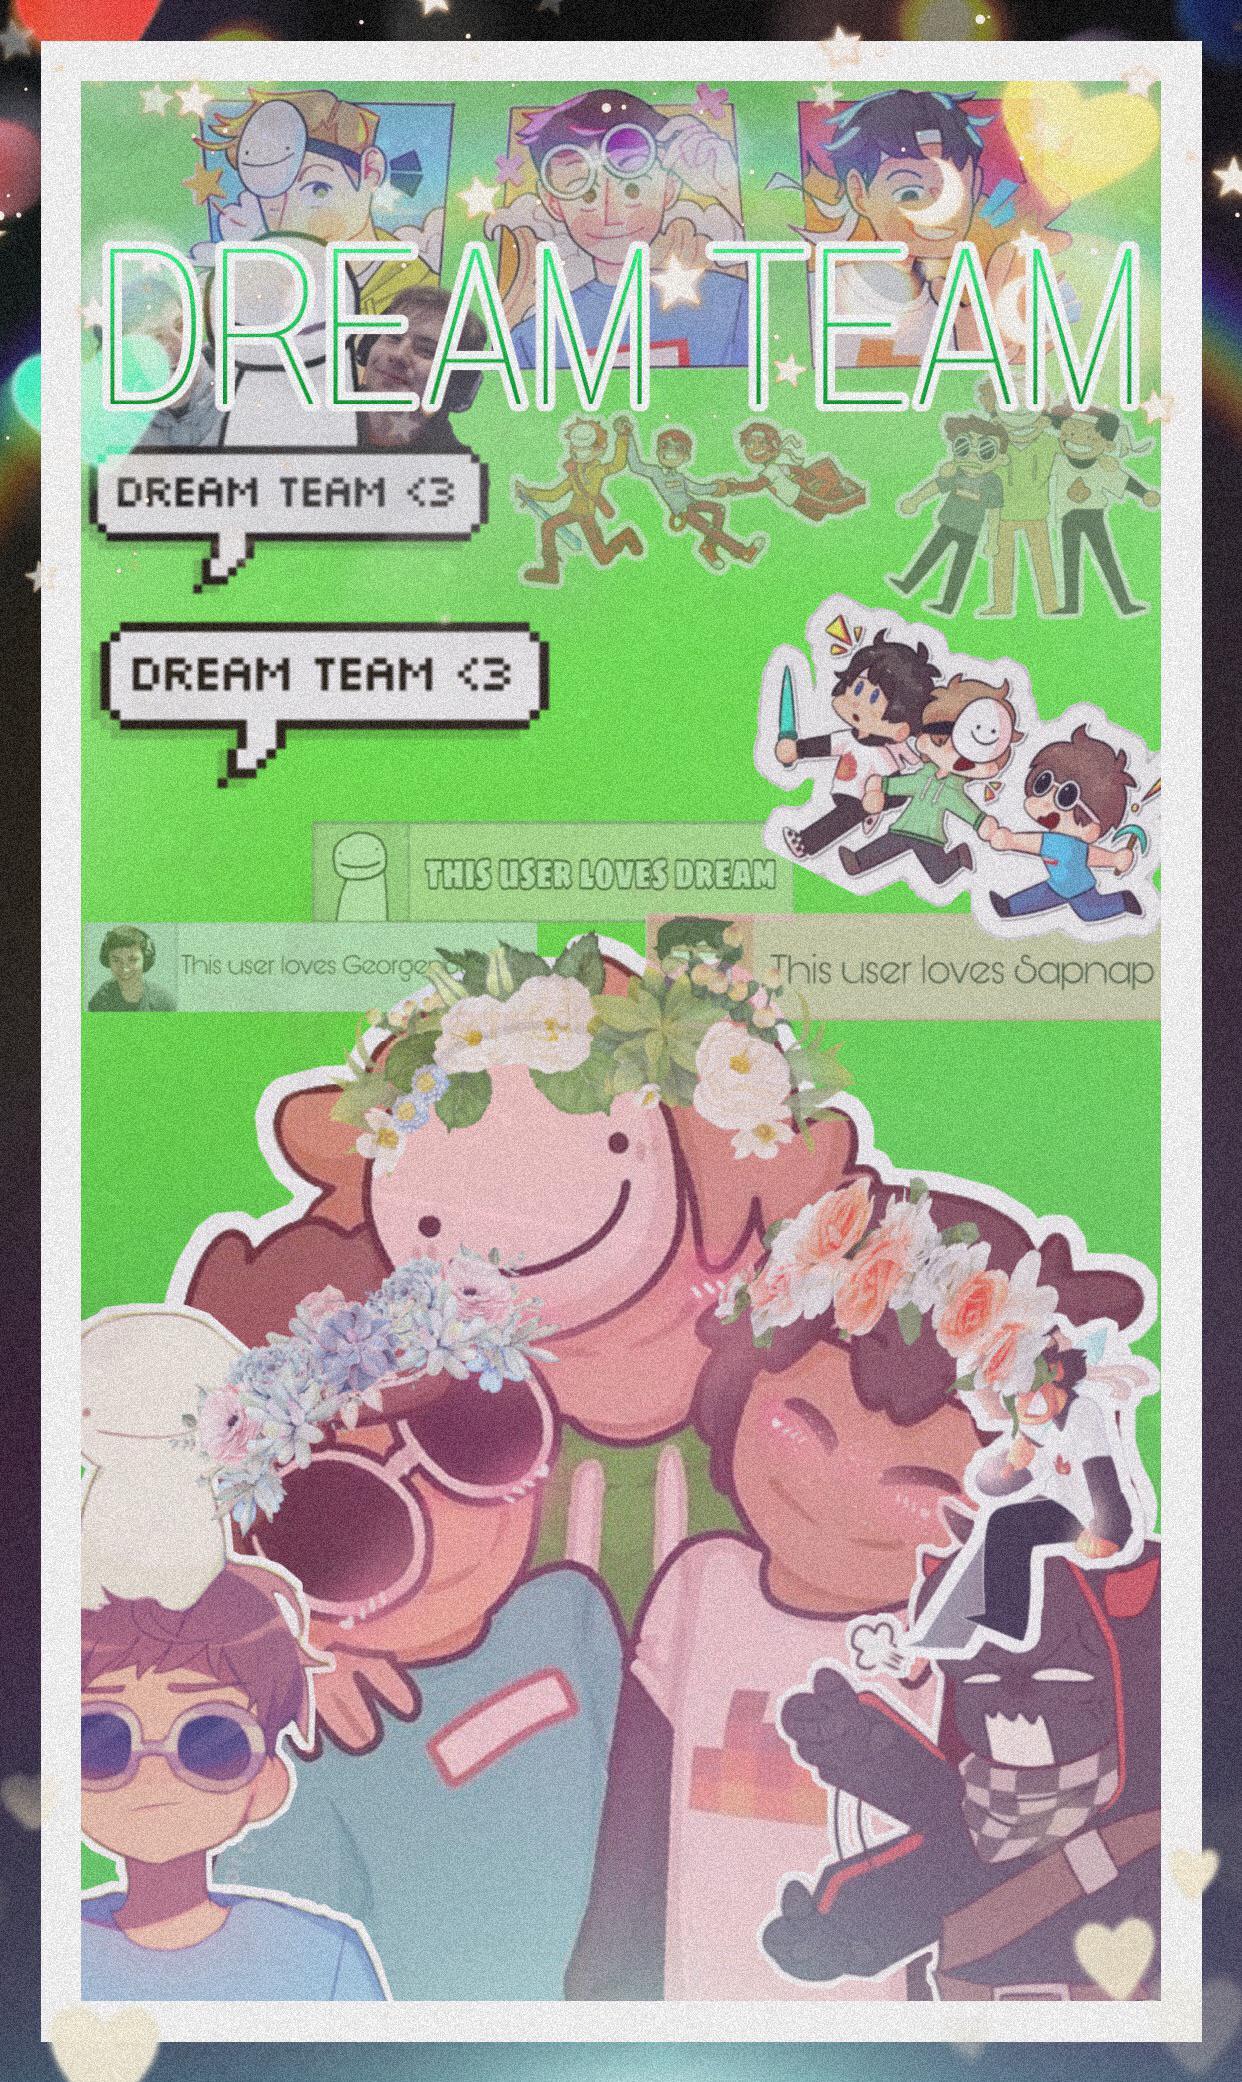 I made a wallpaper of the dream team yeah I kinda suck 1242x2082